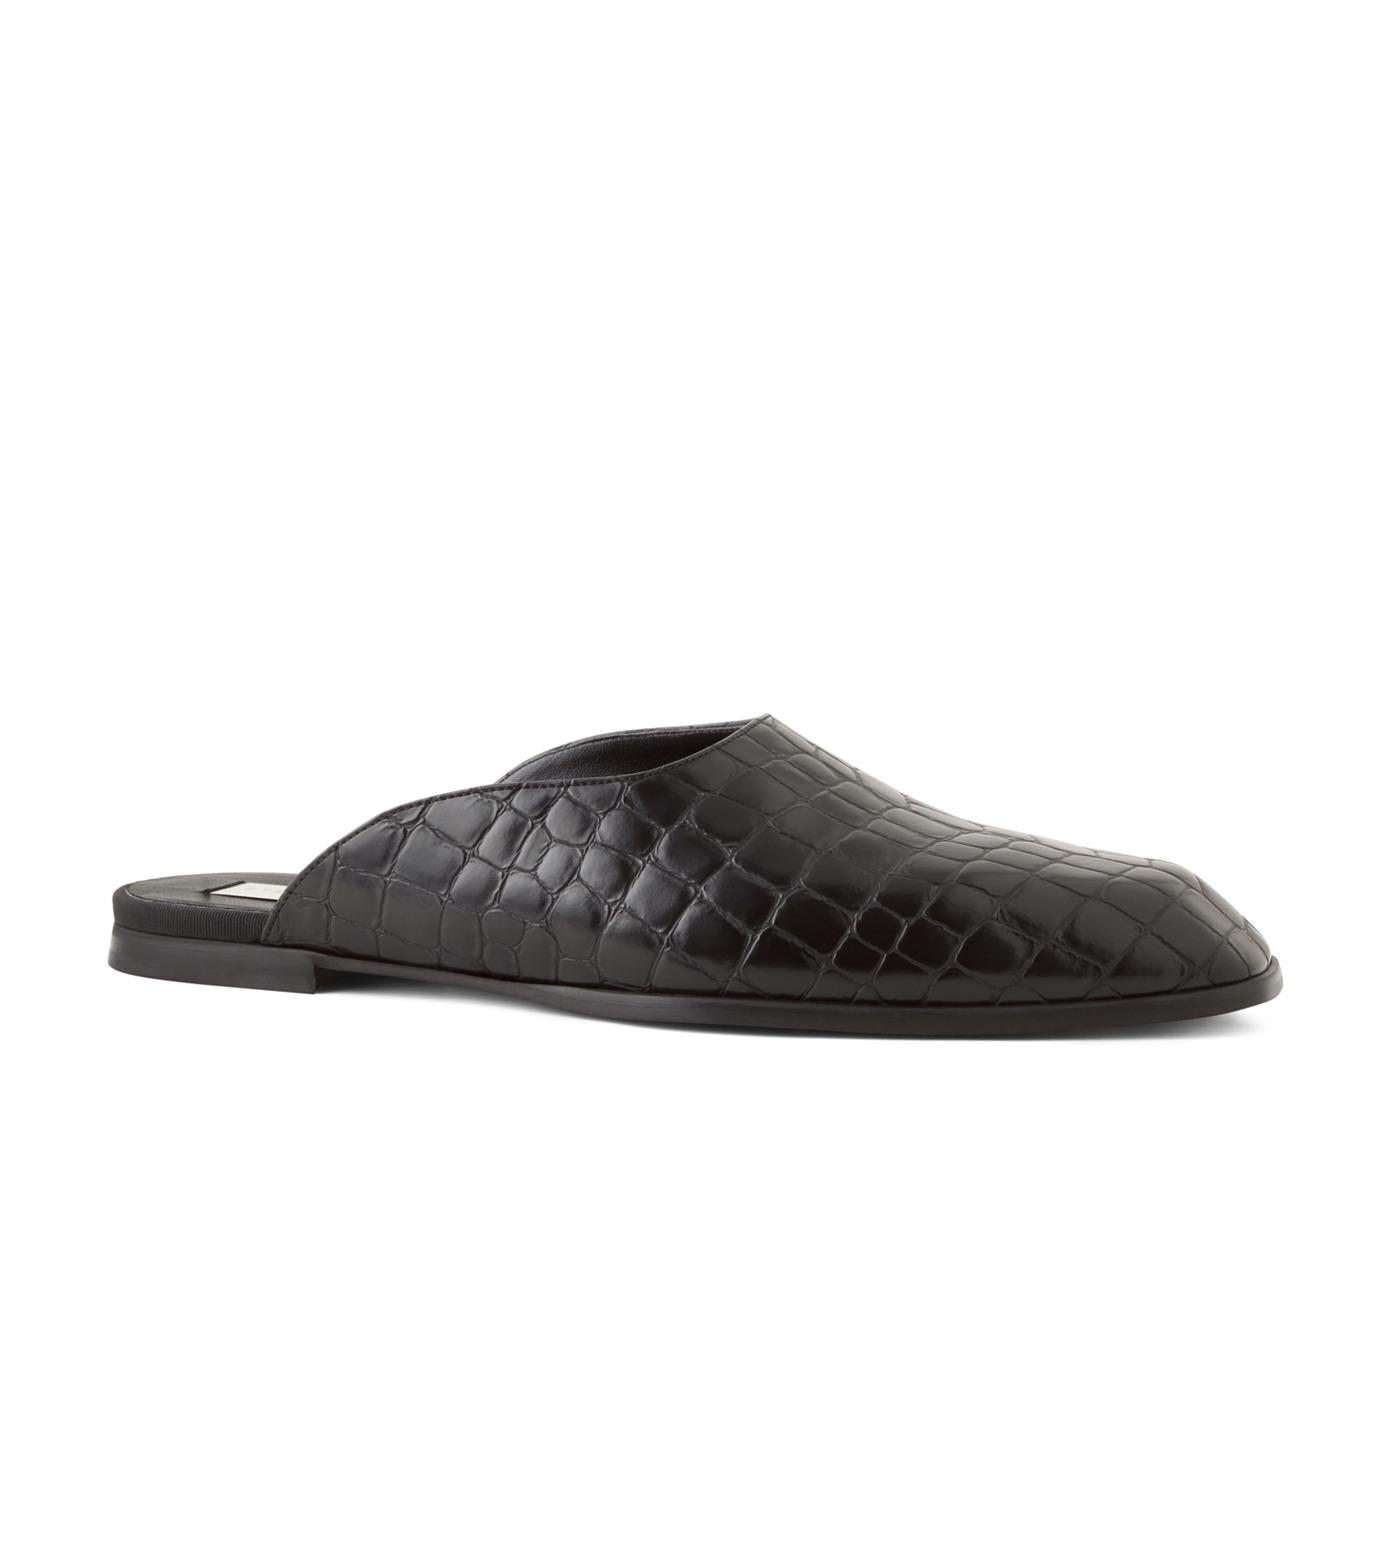 Stella McCartney(ステラマッカートニー)のCroco Moccasion-BLACK(フラットシューズ/Flat shoes)-430856-W0ZY0-13 拡大詳細画像1